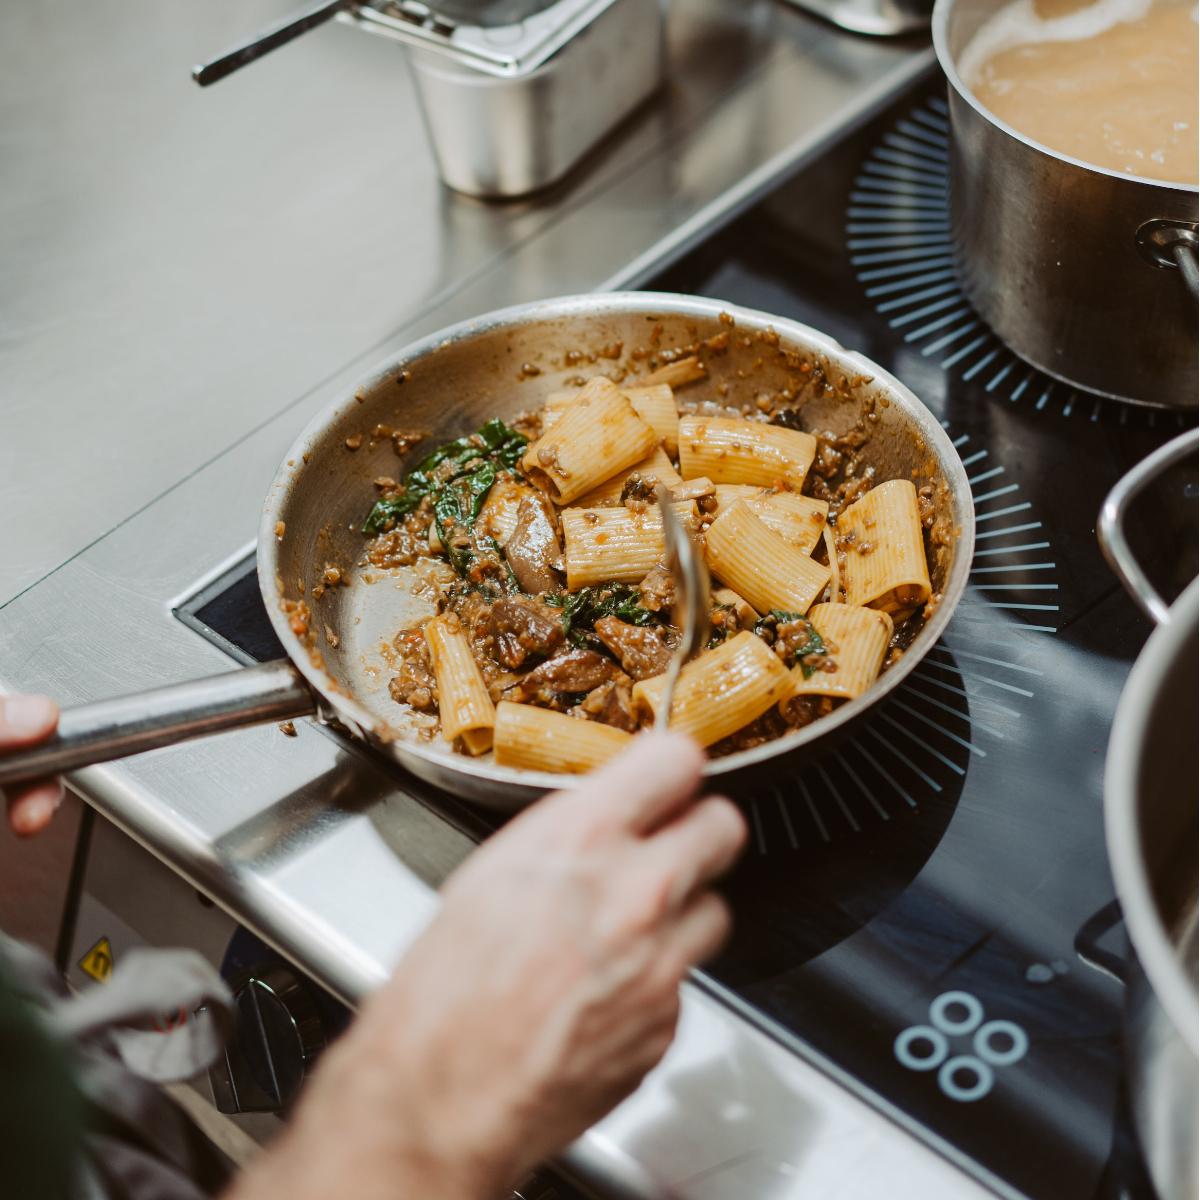 Estelle Dining Prenzlauer Berg Pasta